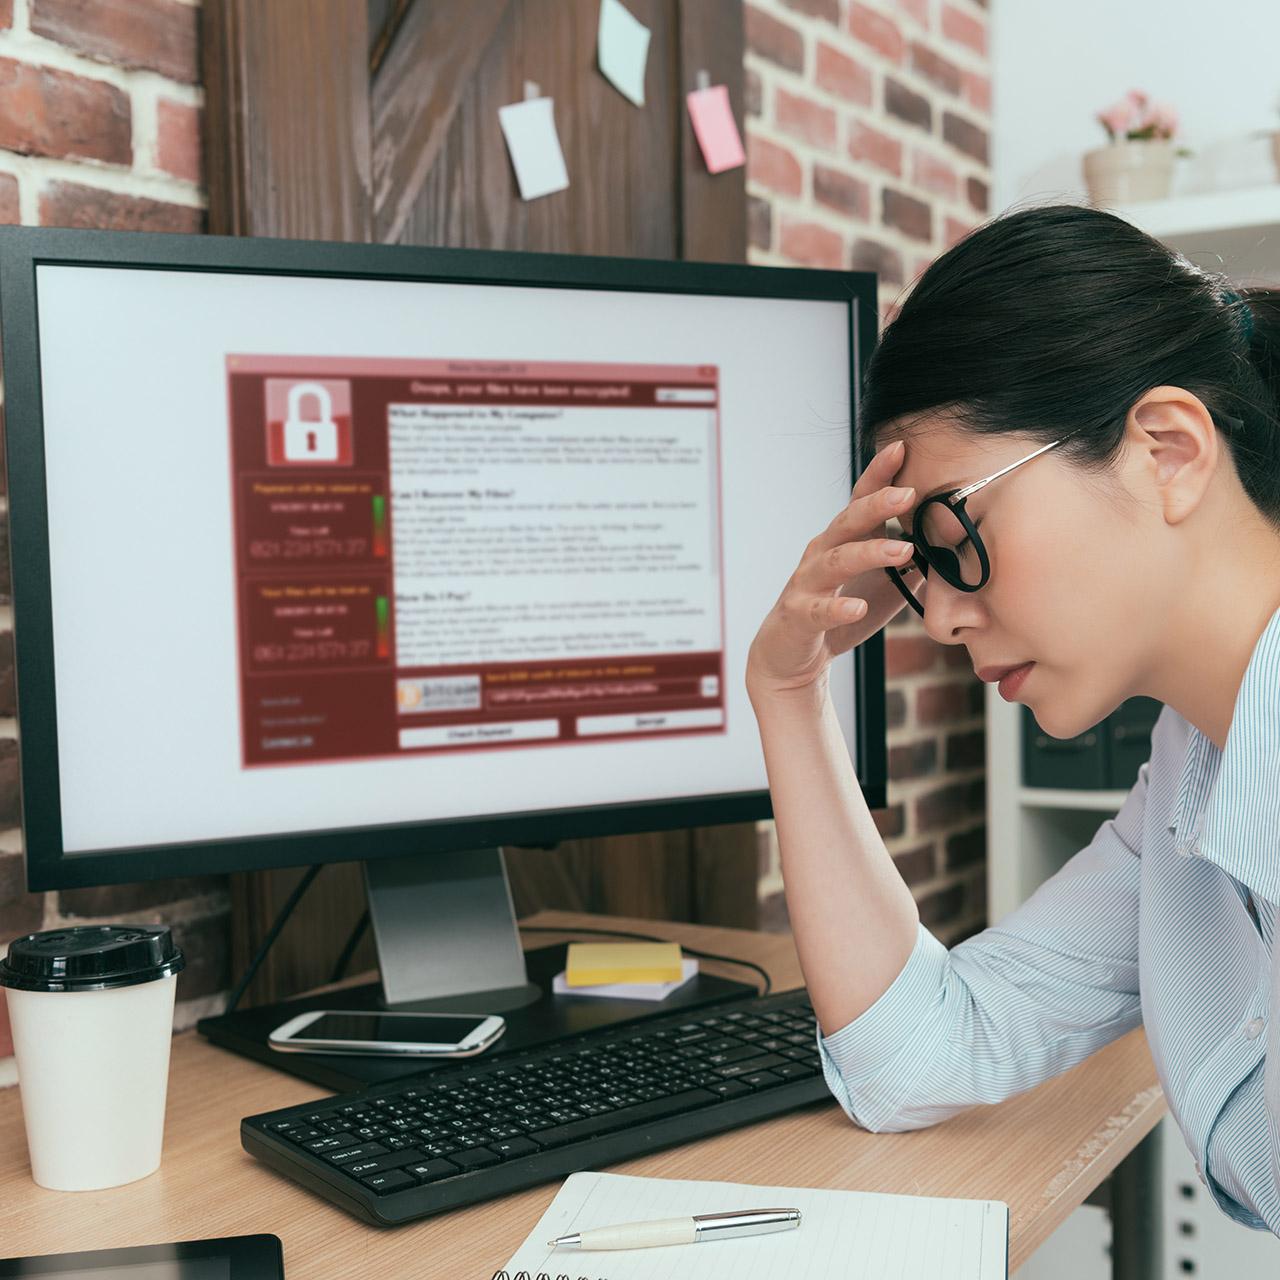 cyber security threat prep